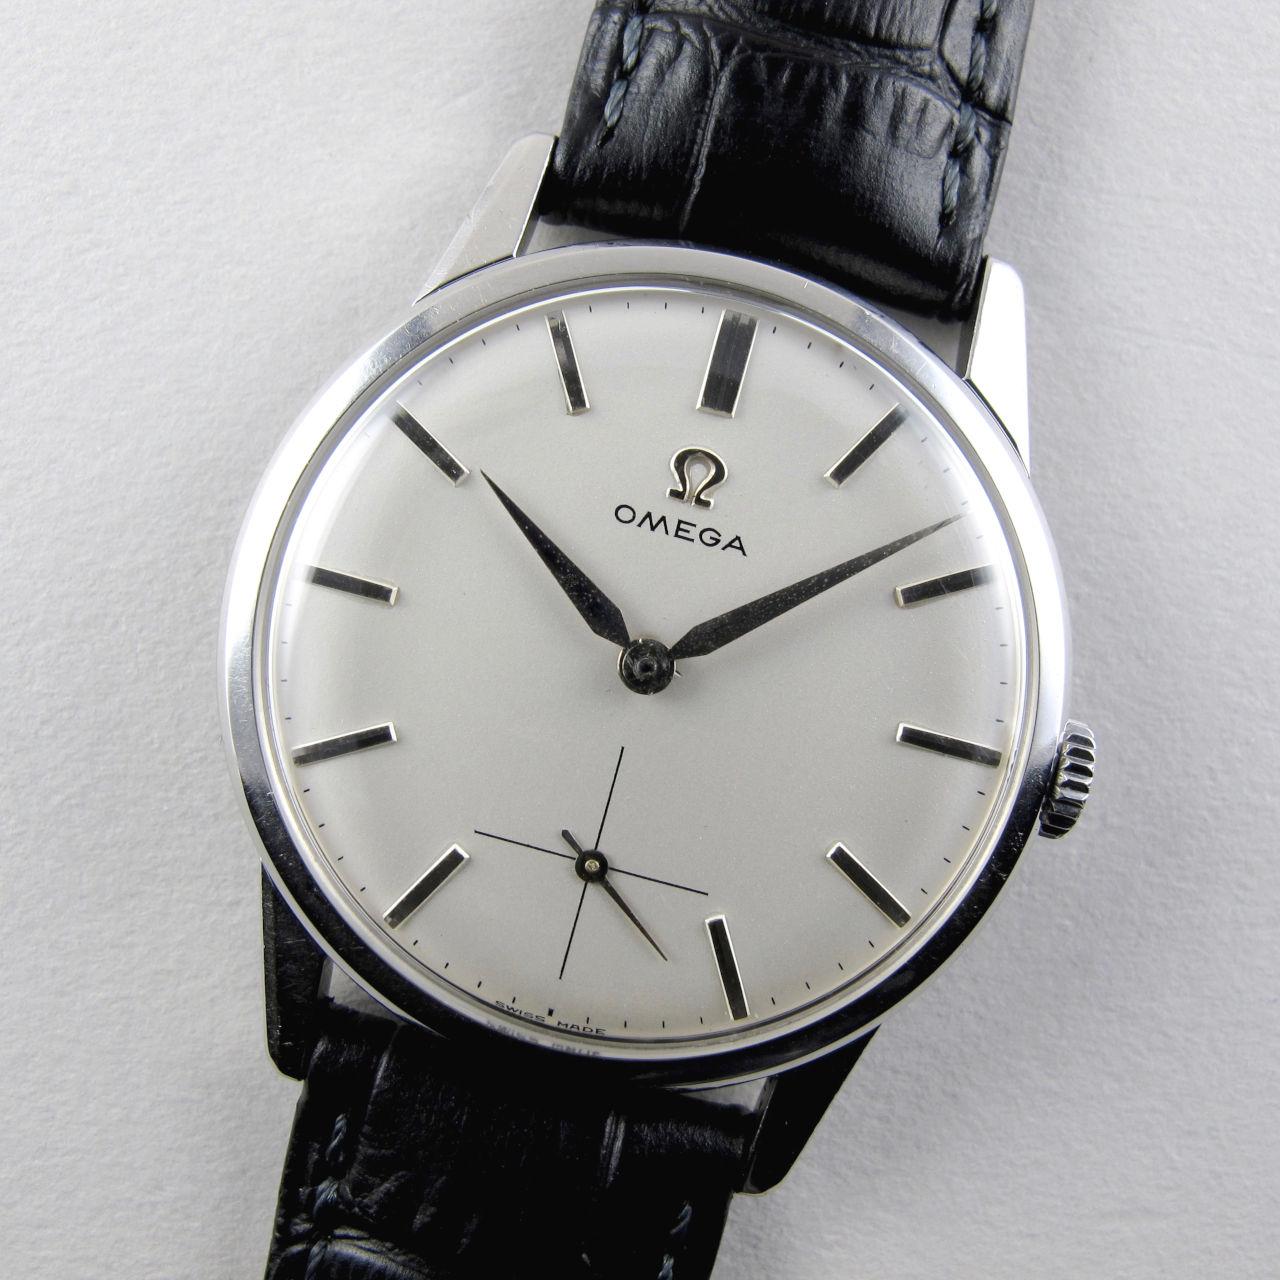 Omega Ref. 14713 -9 steel vintage wristwatch, circa 1961